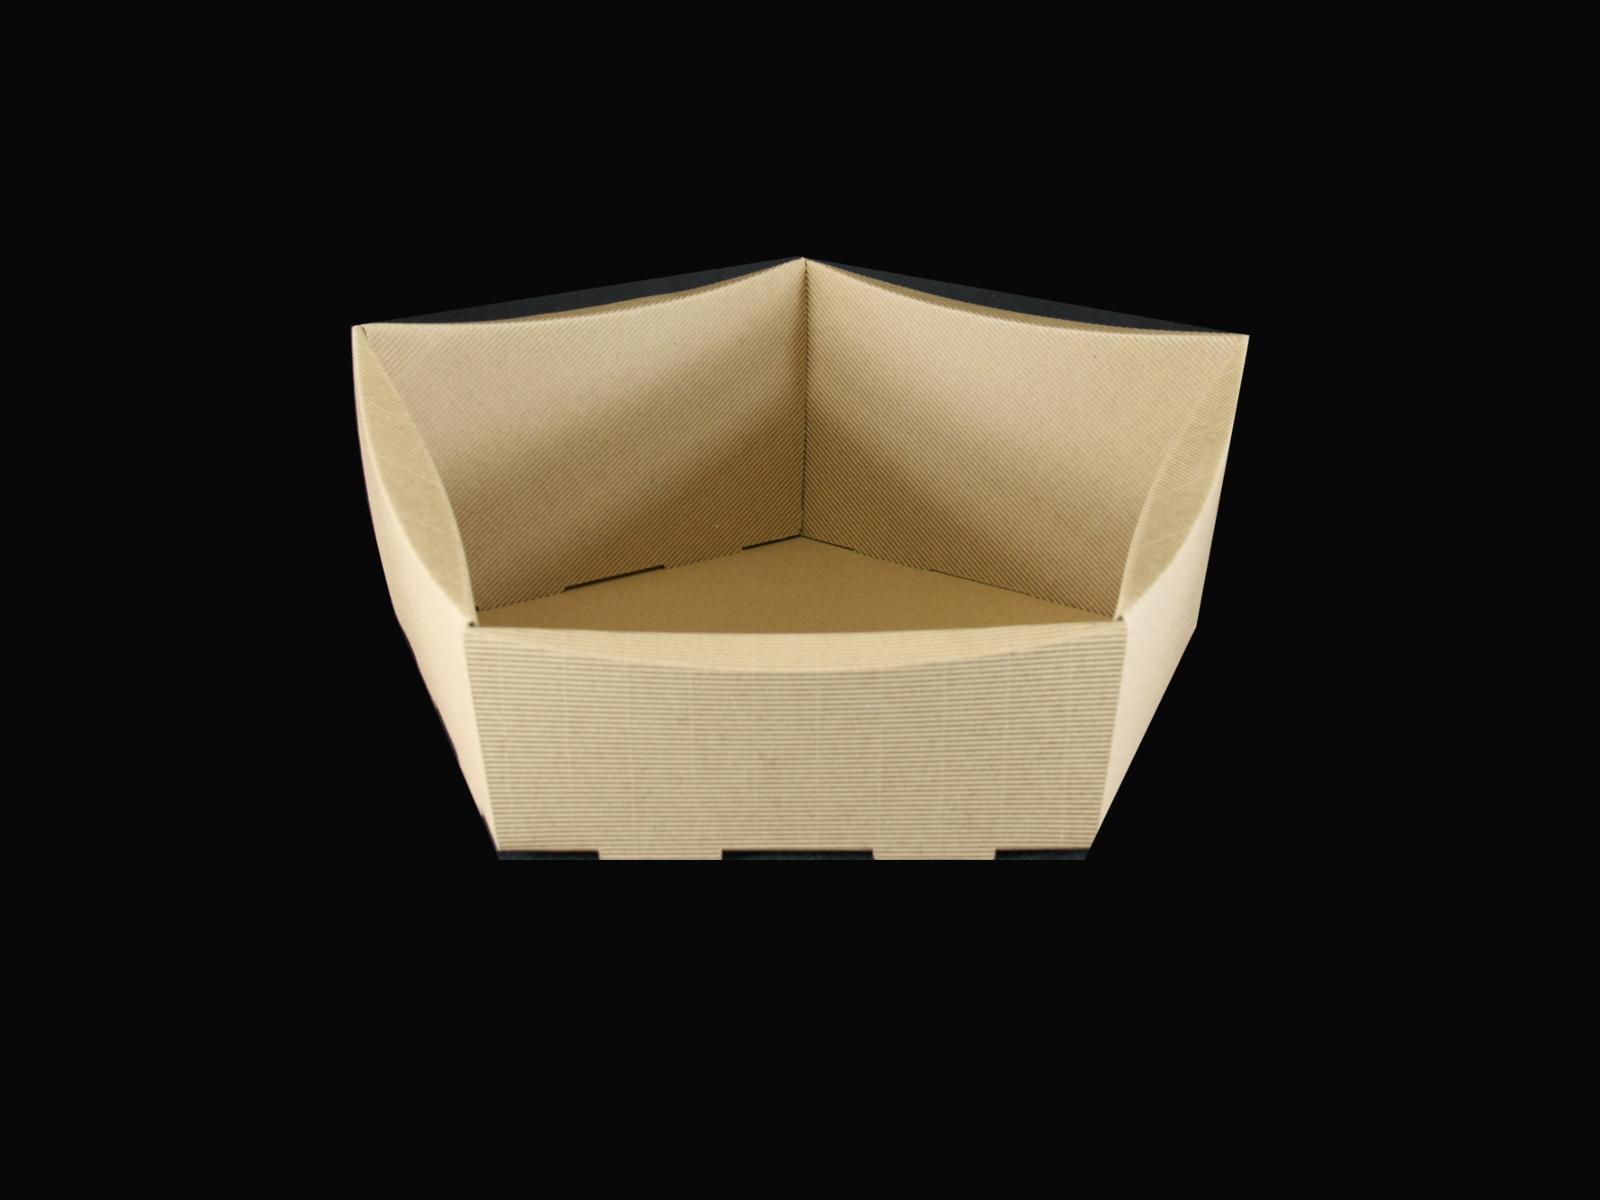 Pentagon Cardboard Gift Basket 29x30x8x13cm